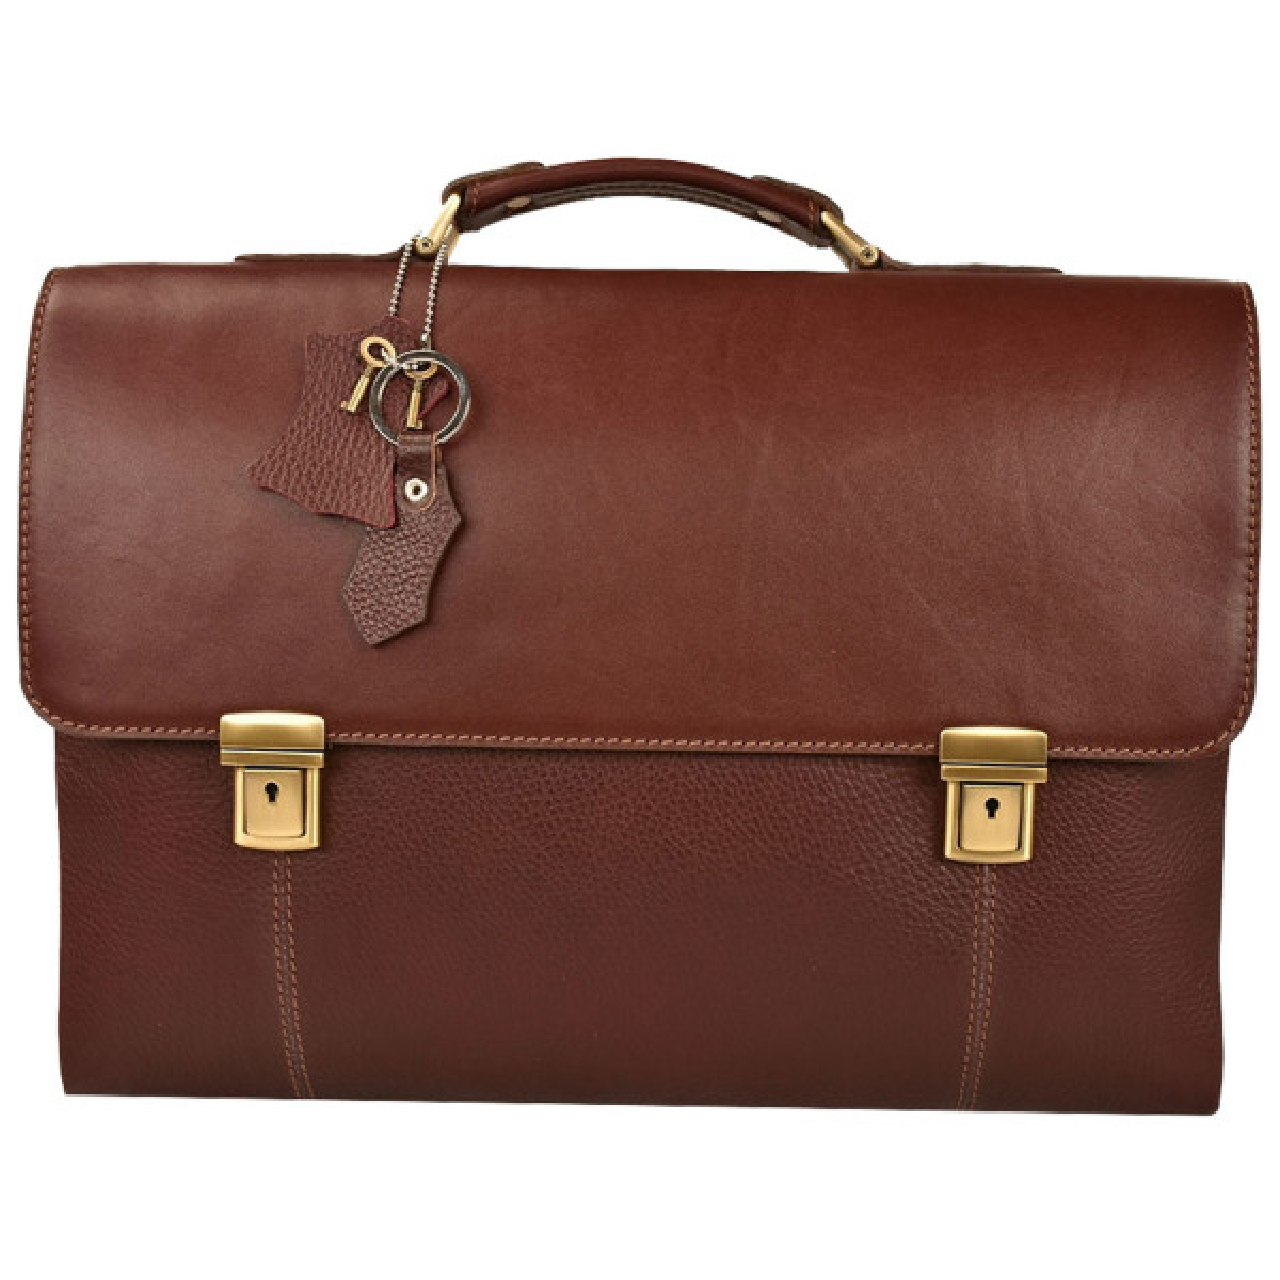 کیف اداری مردانه پارینه چرم مدل L140